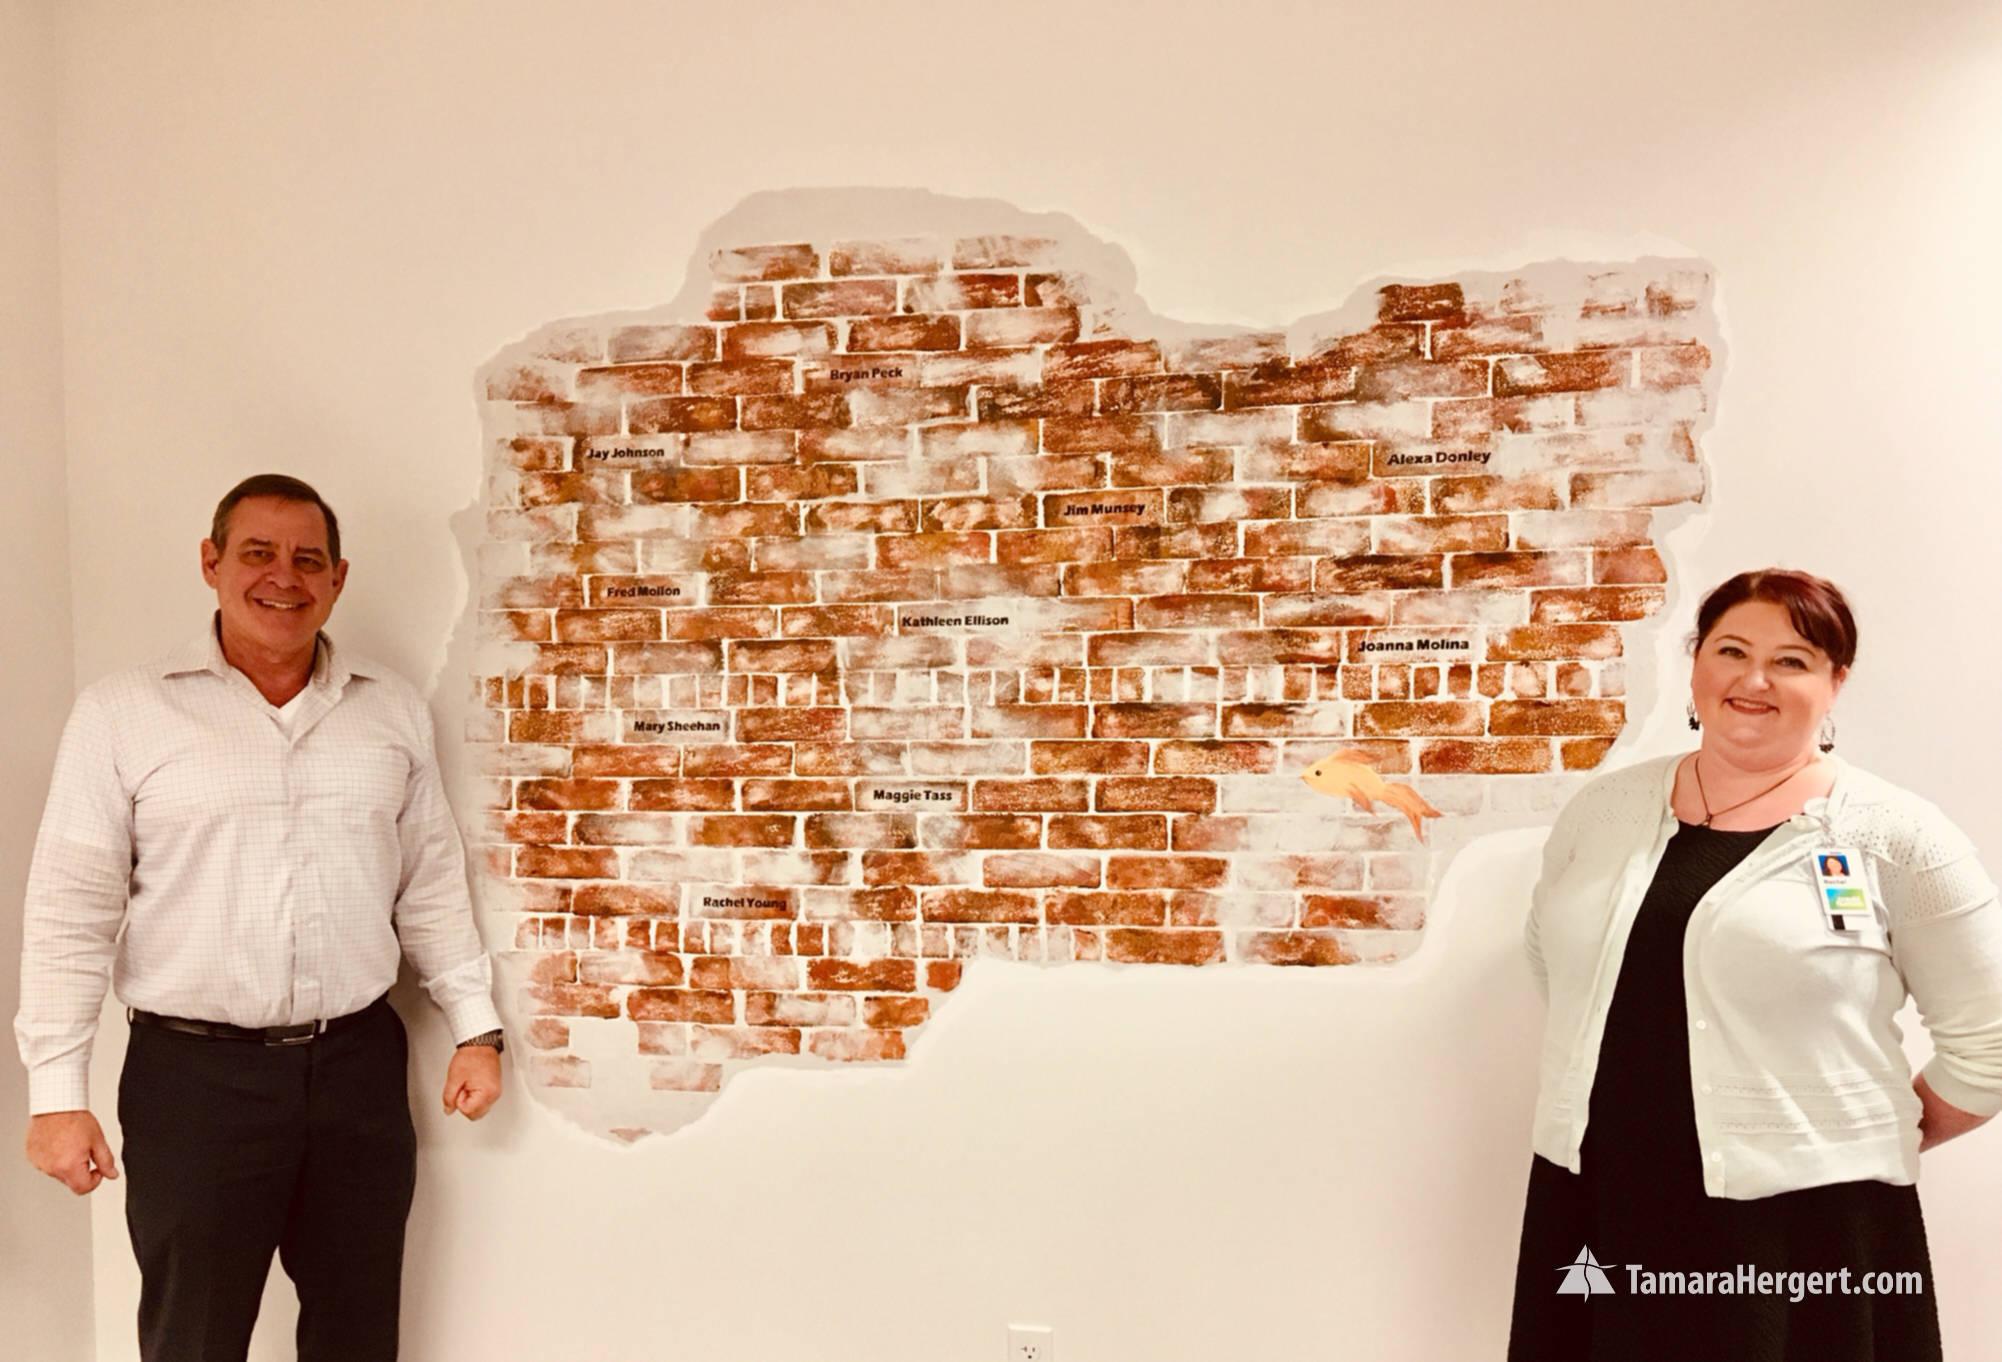 Brick wall - faux bricks mural by Tamara